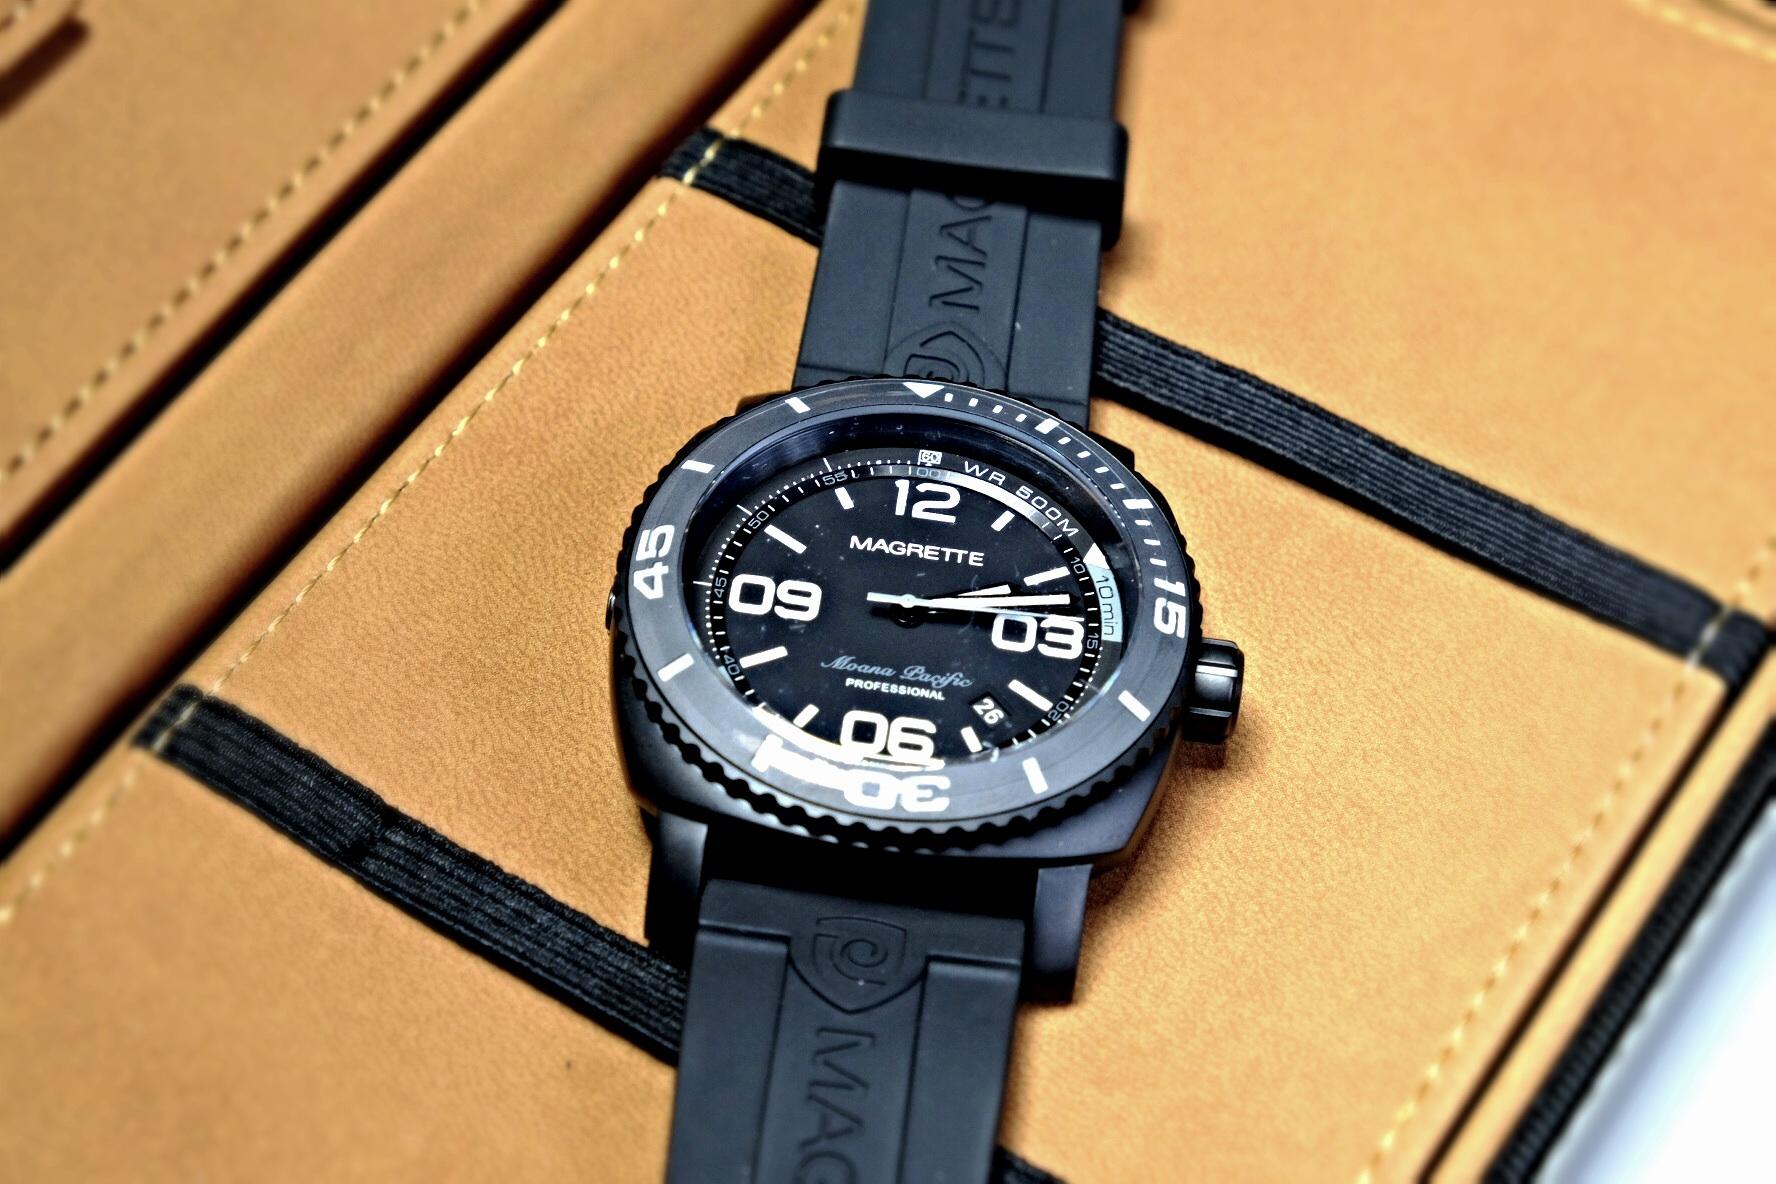 Kiwi Uhr Magrette Moana Pacific Pro All Black Uhrforum